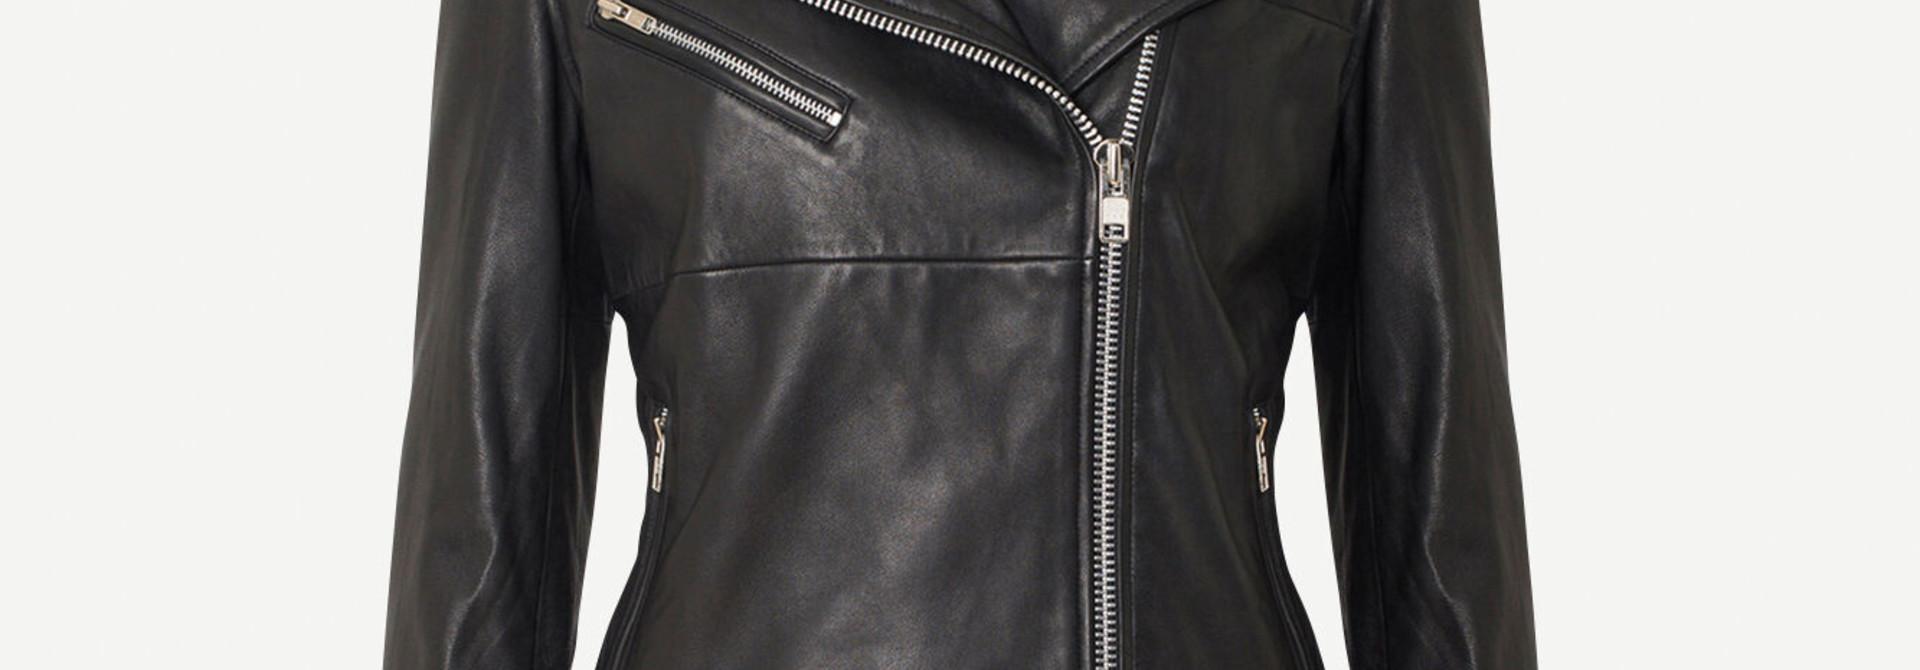 tautou leather jacket samsoe samsoe